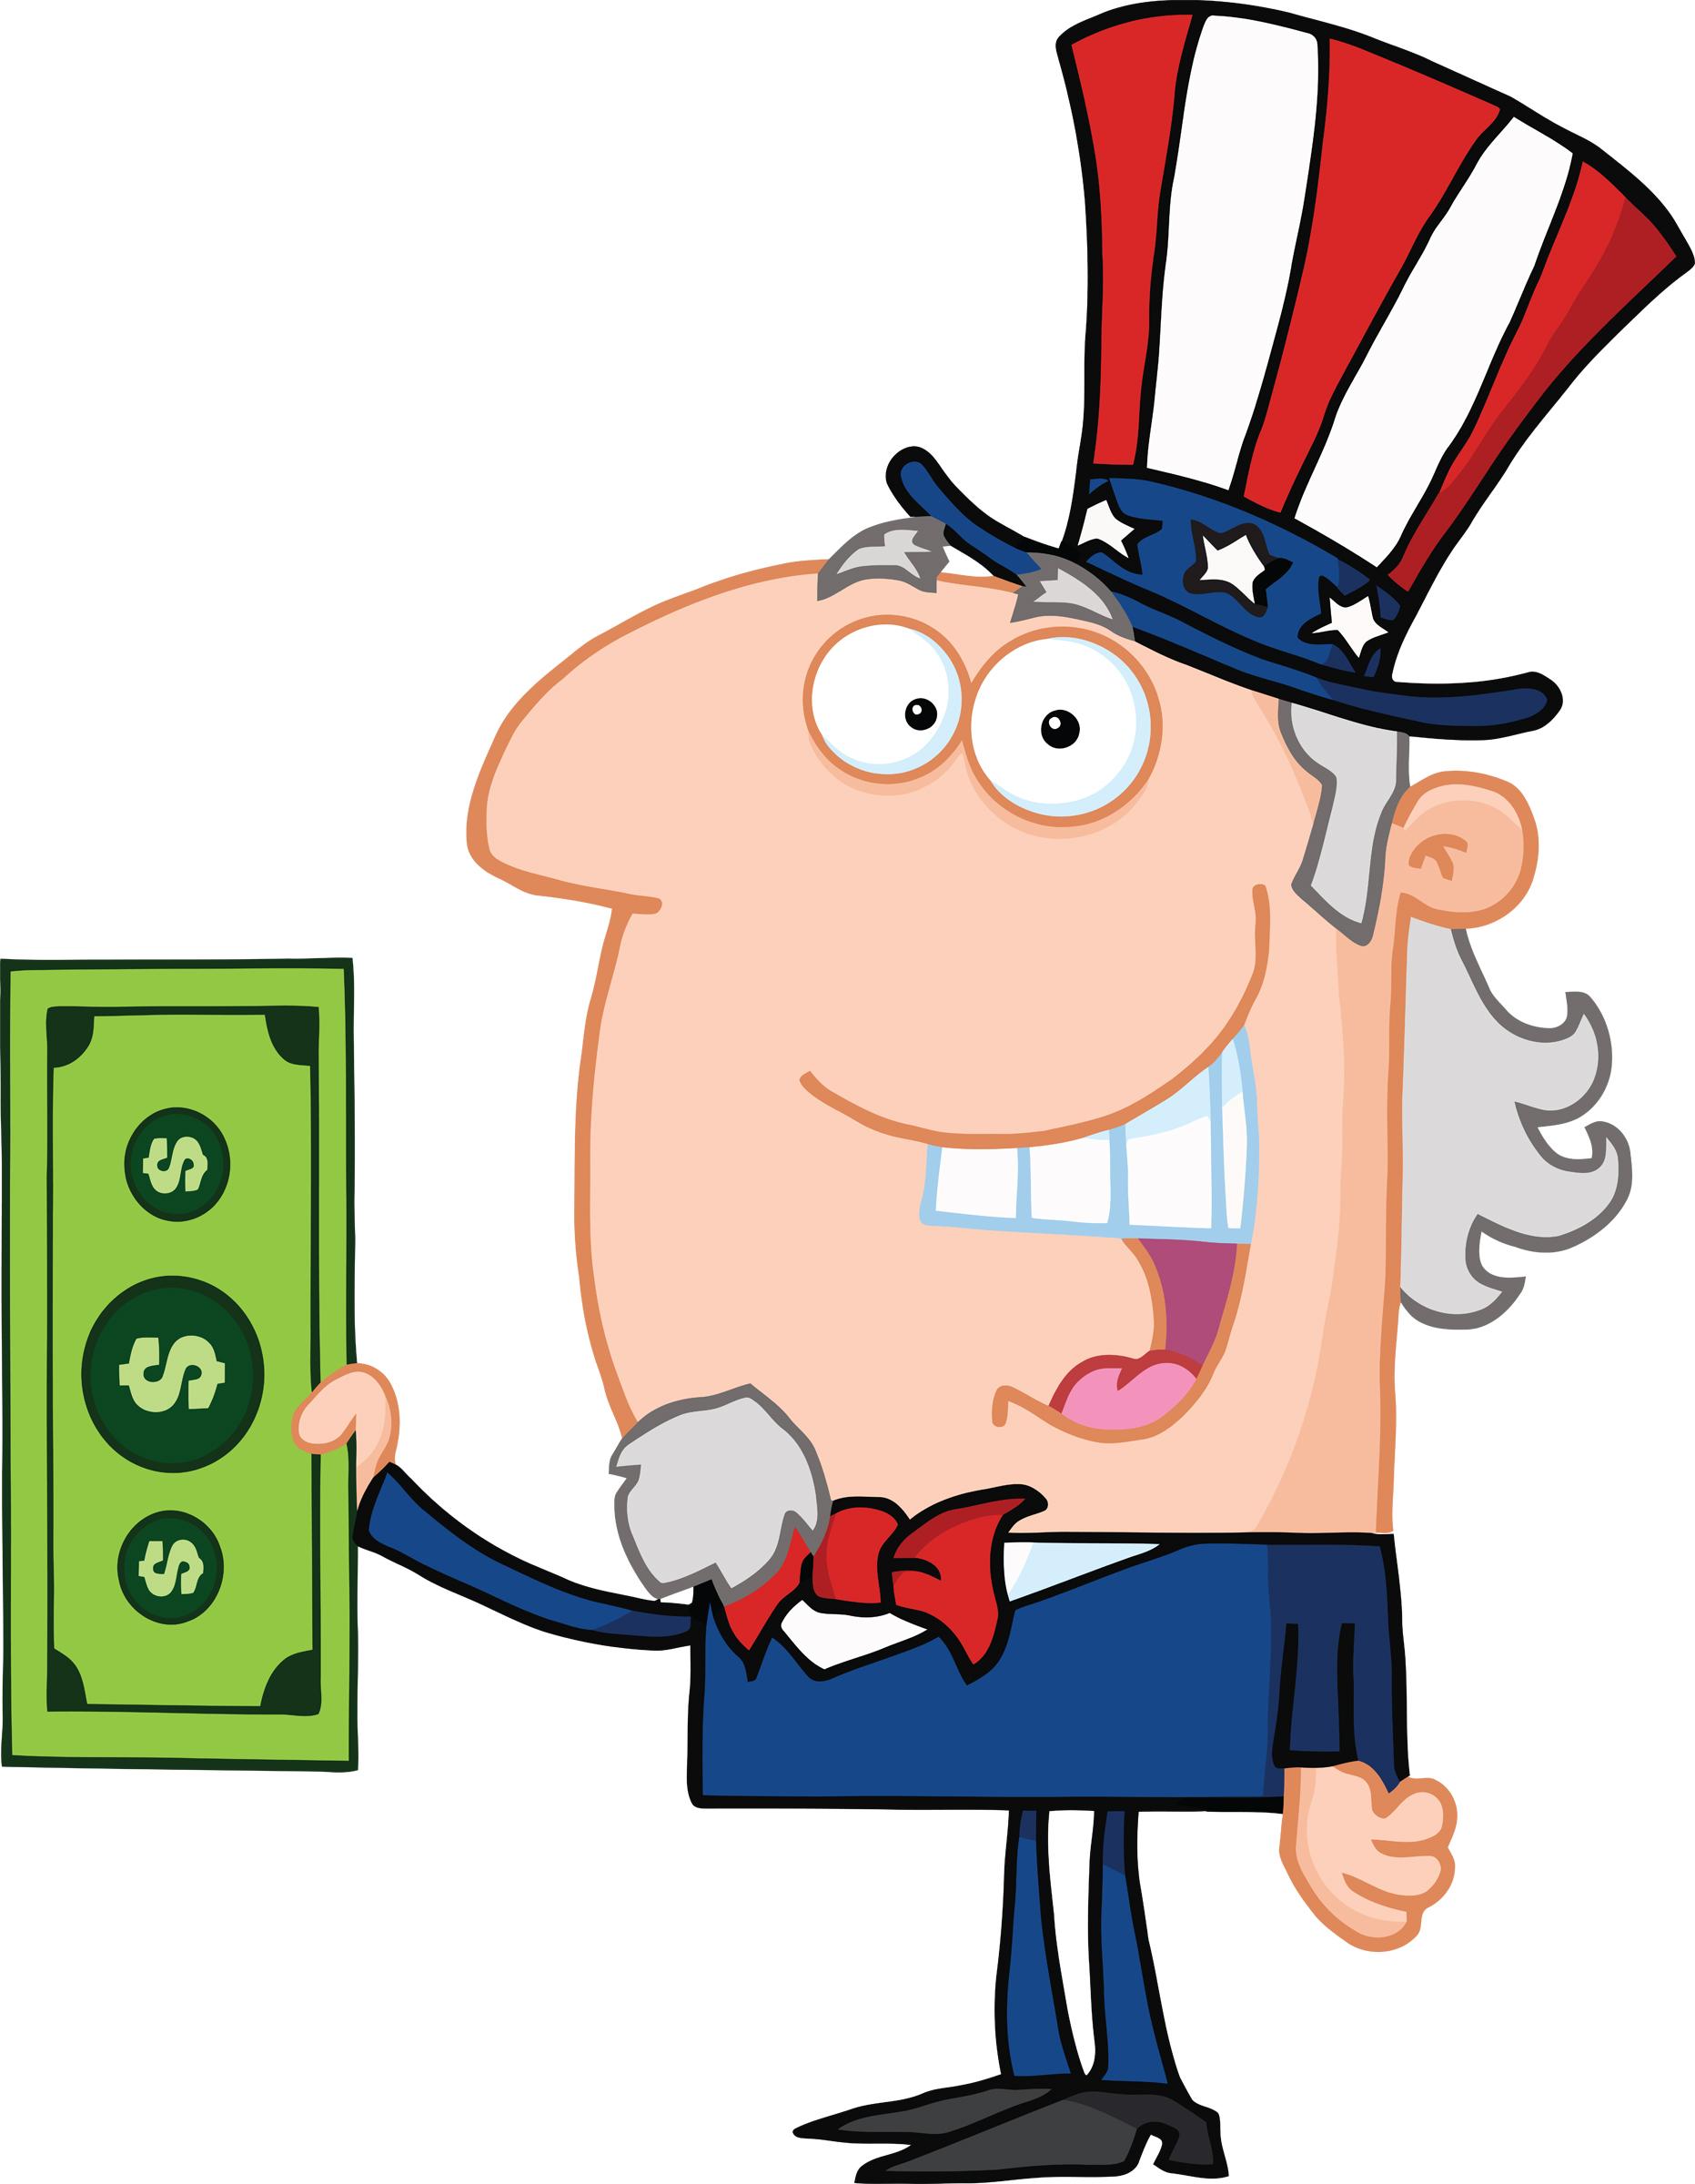 Uncle Sam clipart sales tax Images Panda Art tax%20clipart Free